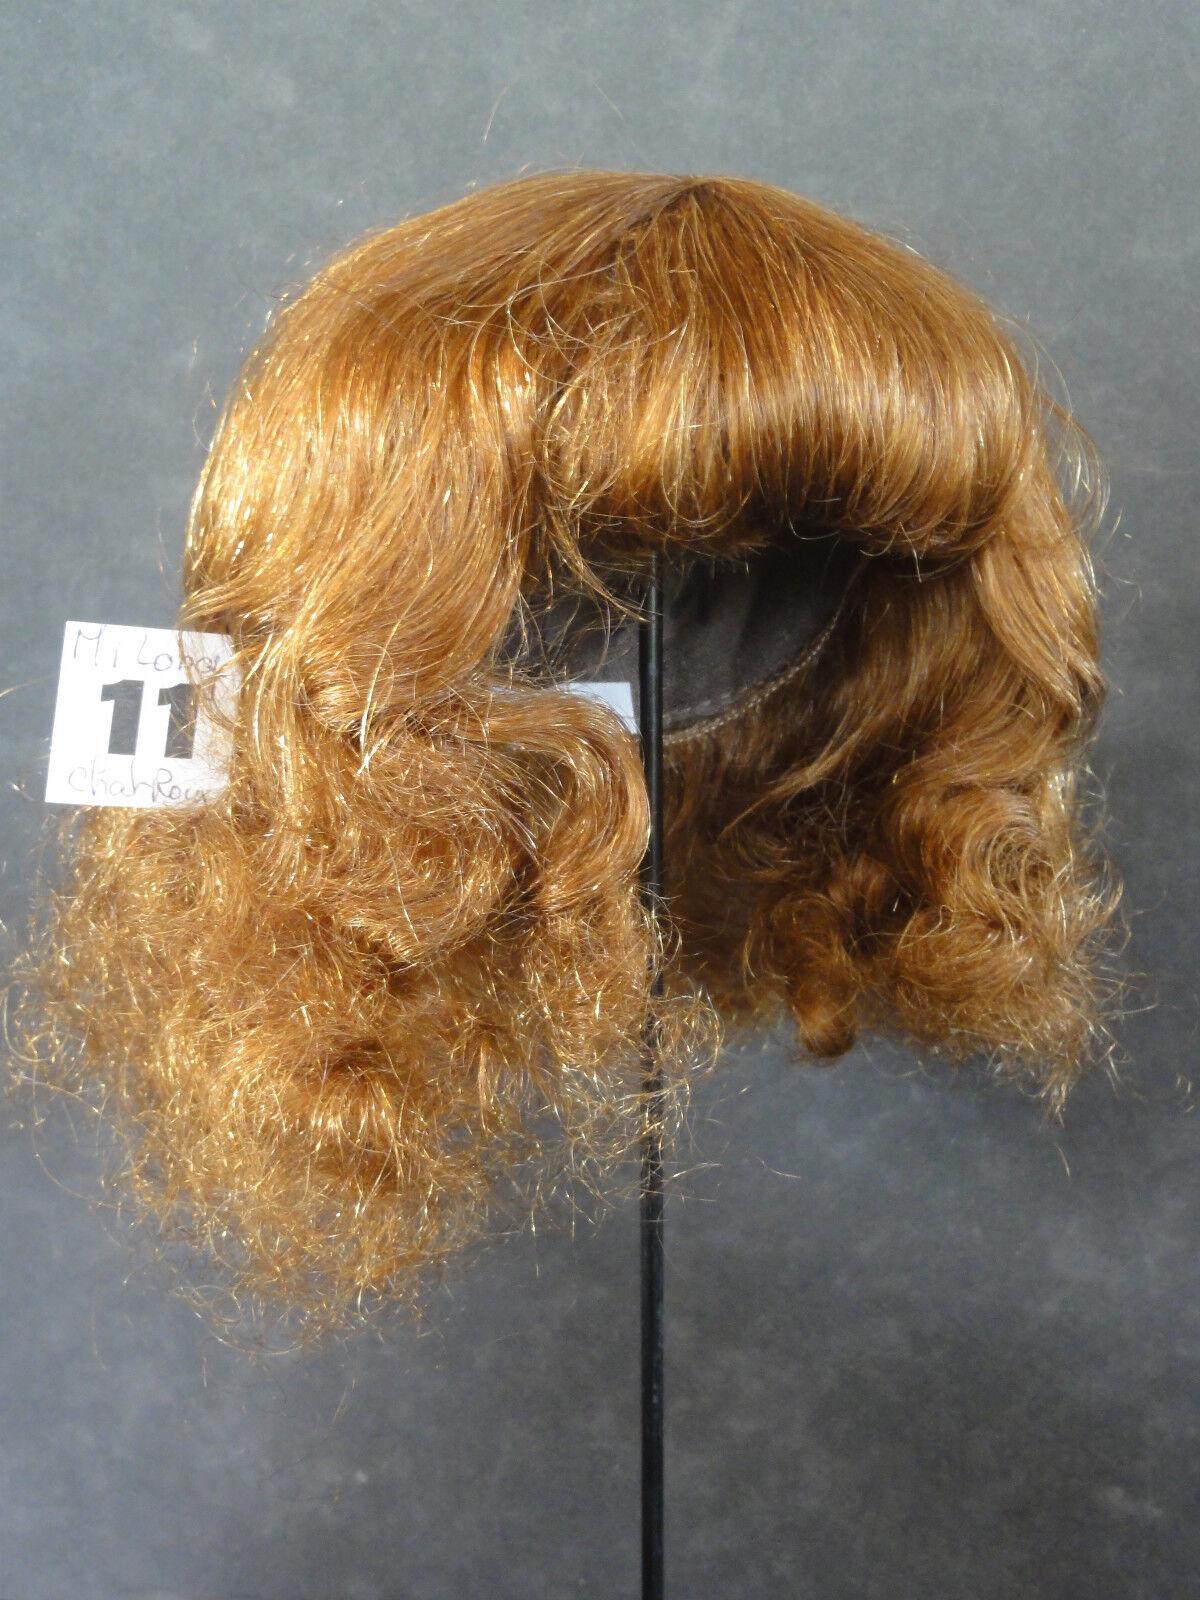 50% Promo Perücke Puppe T11 (34cm) 100% Haare Haare Haare Halb Longue-Doll Perücke 631ac4